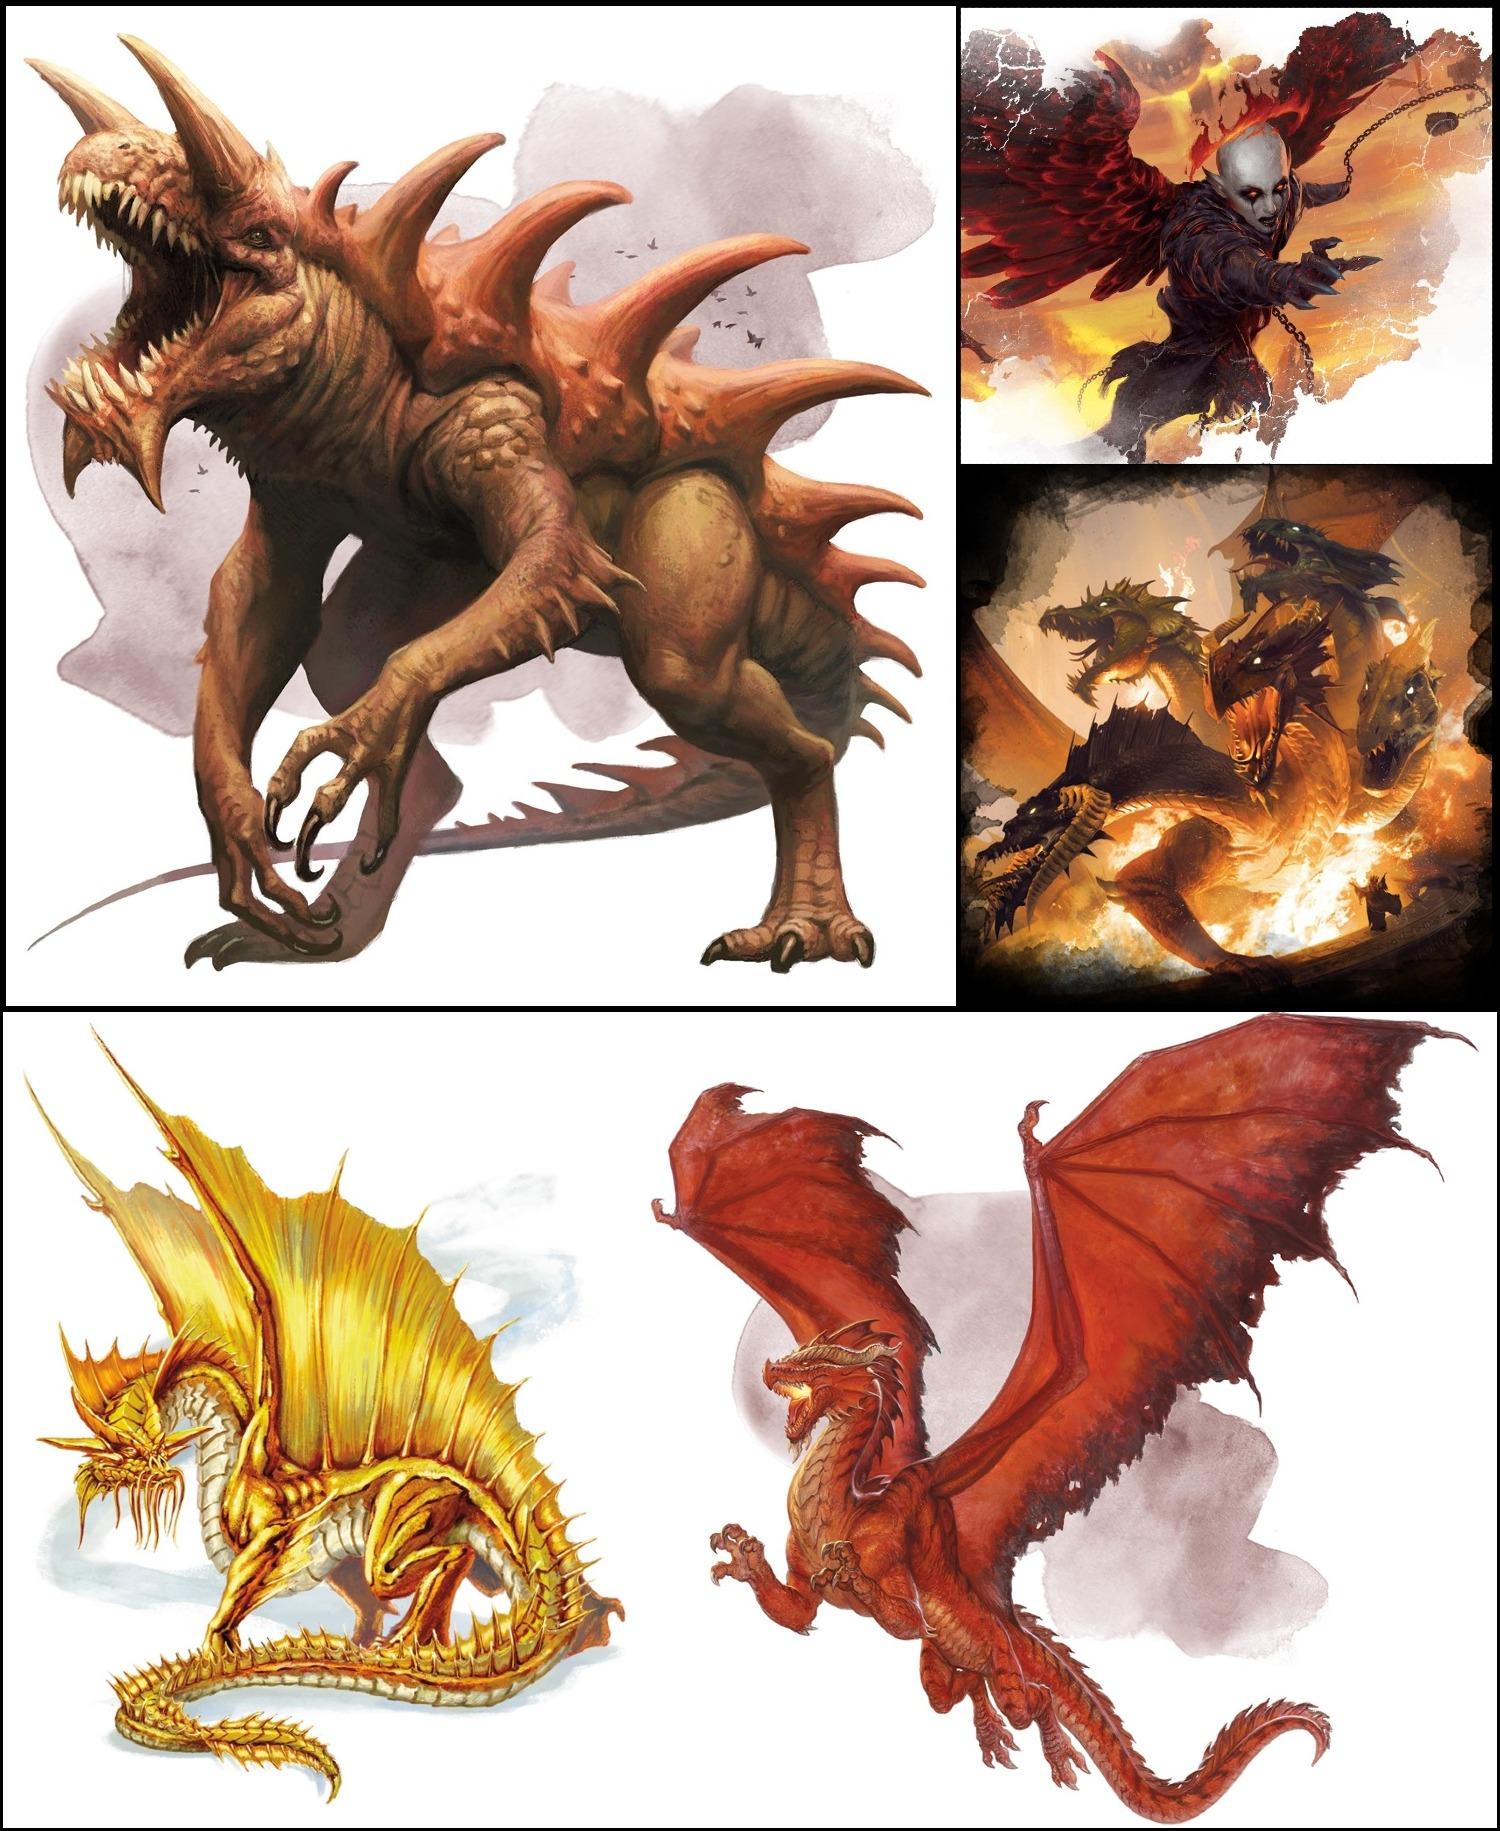 5E D&D monsters hit points tarrasque zariel tiamat gold dragon red dragon